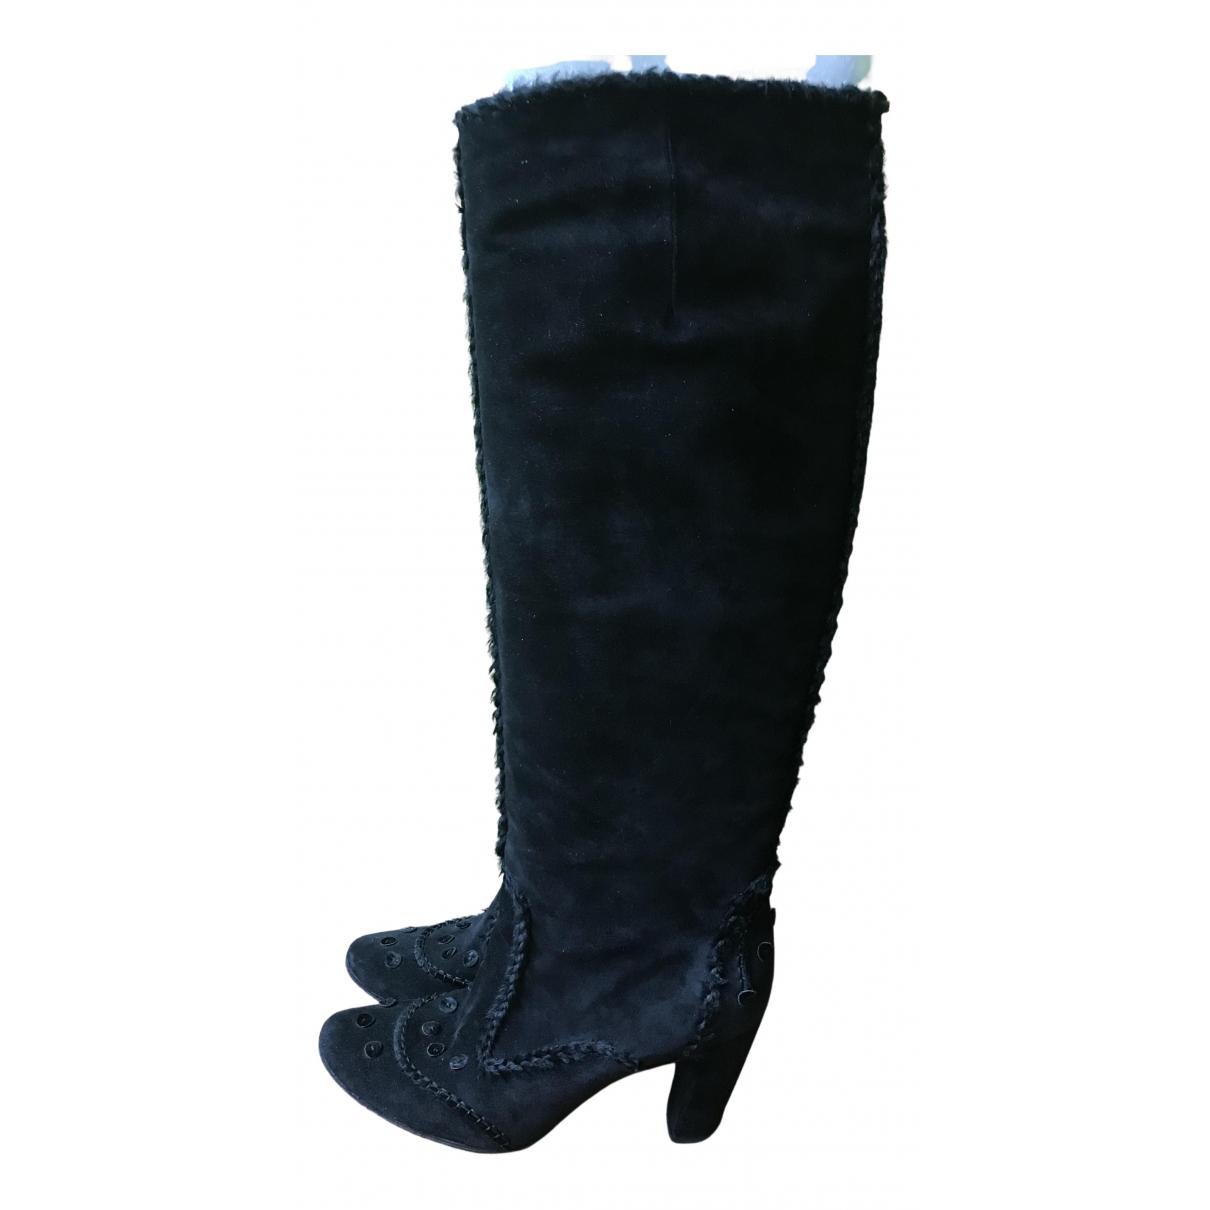 Roger Vivier N Black Suede Boots for Women 40.5 IT